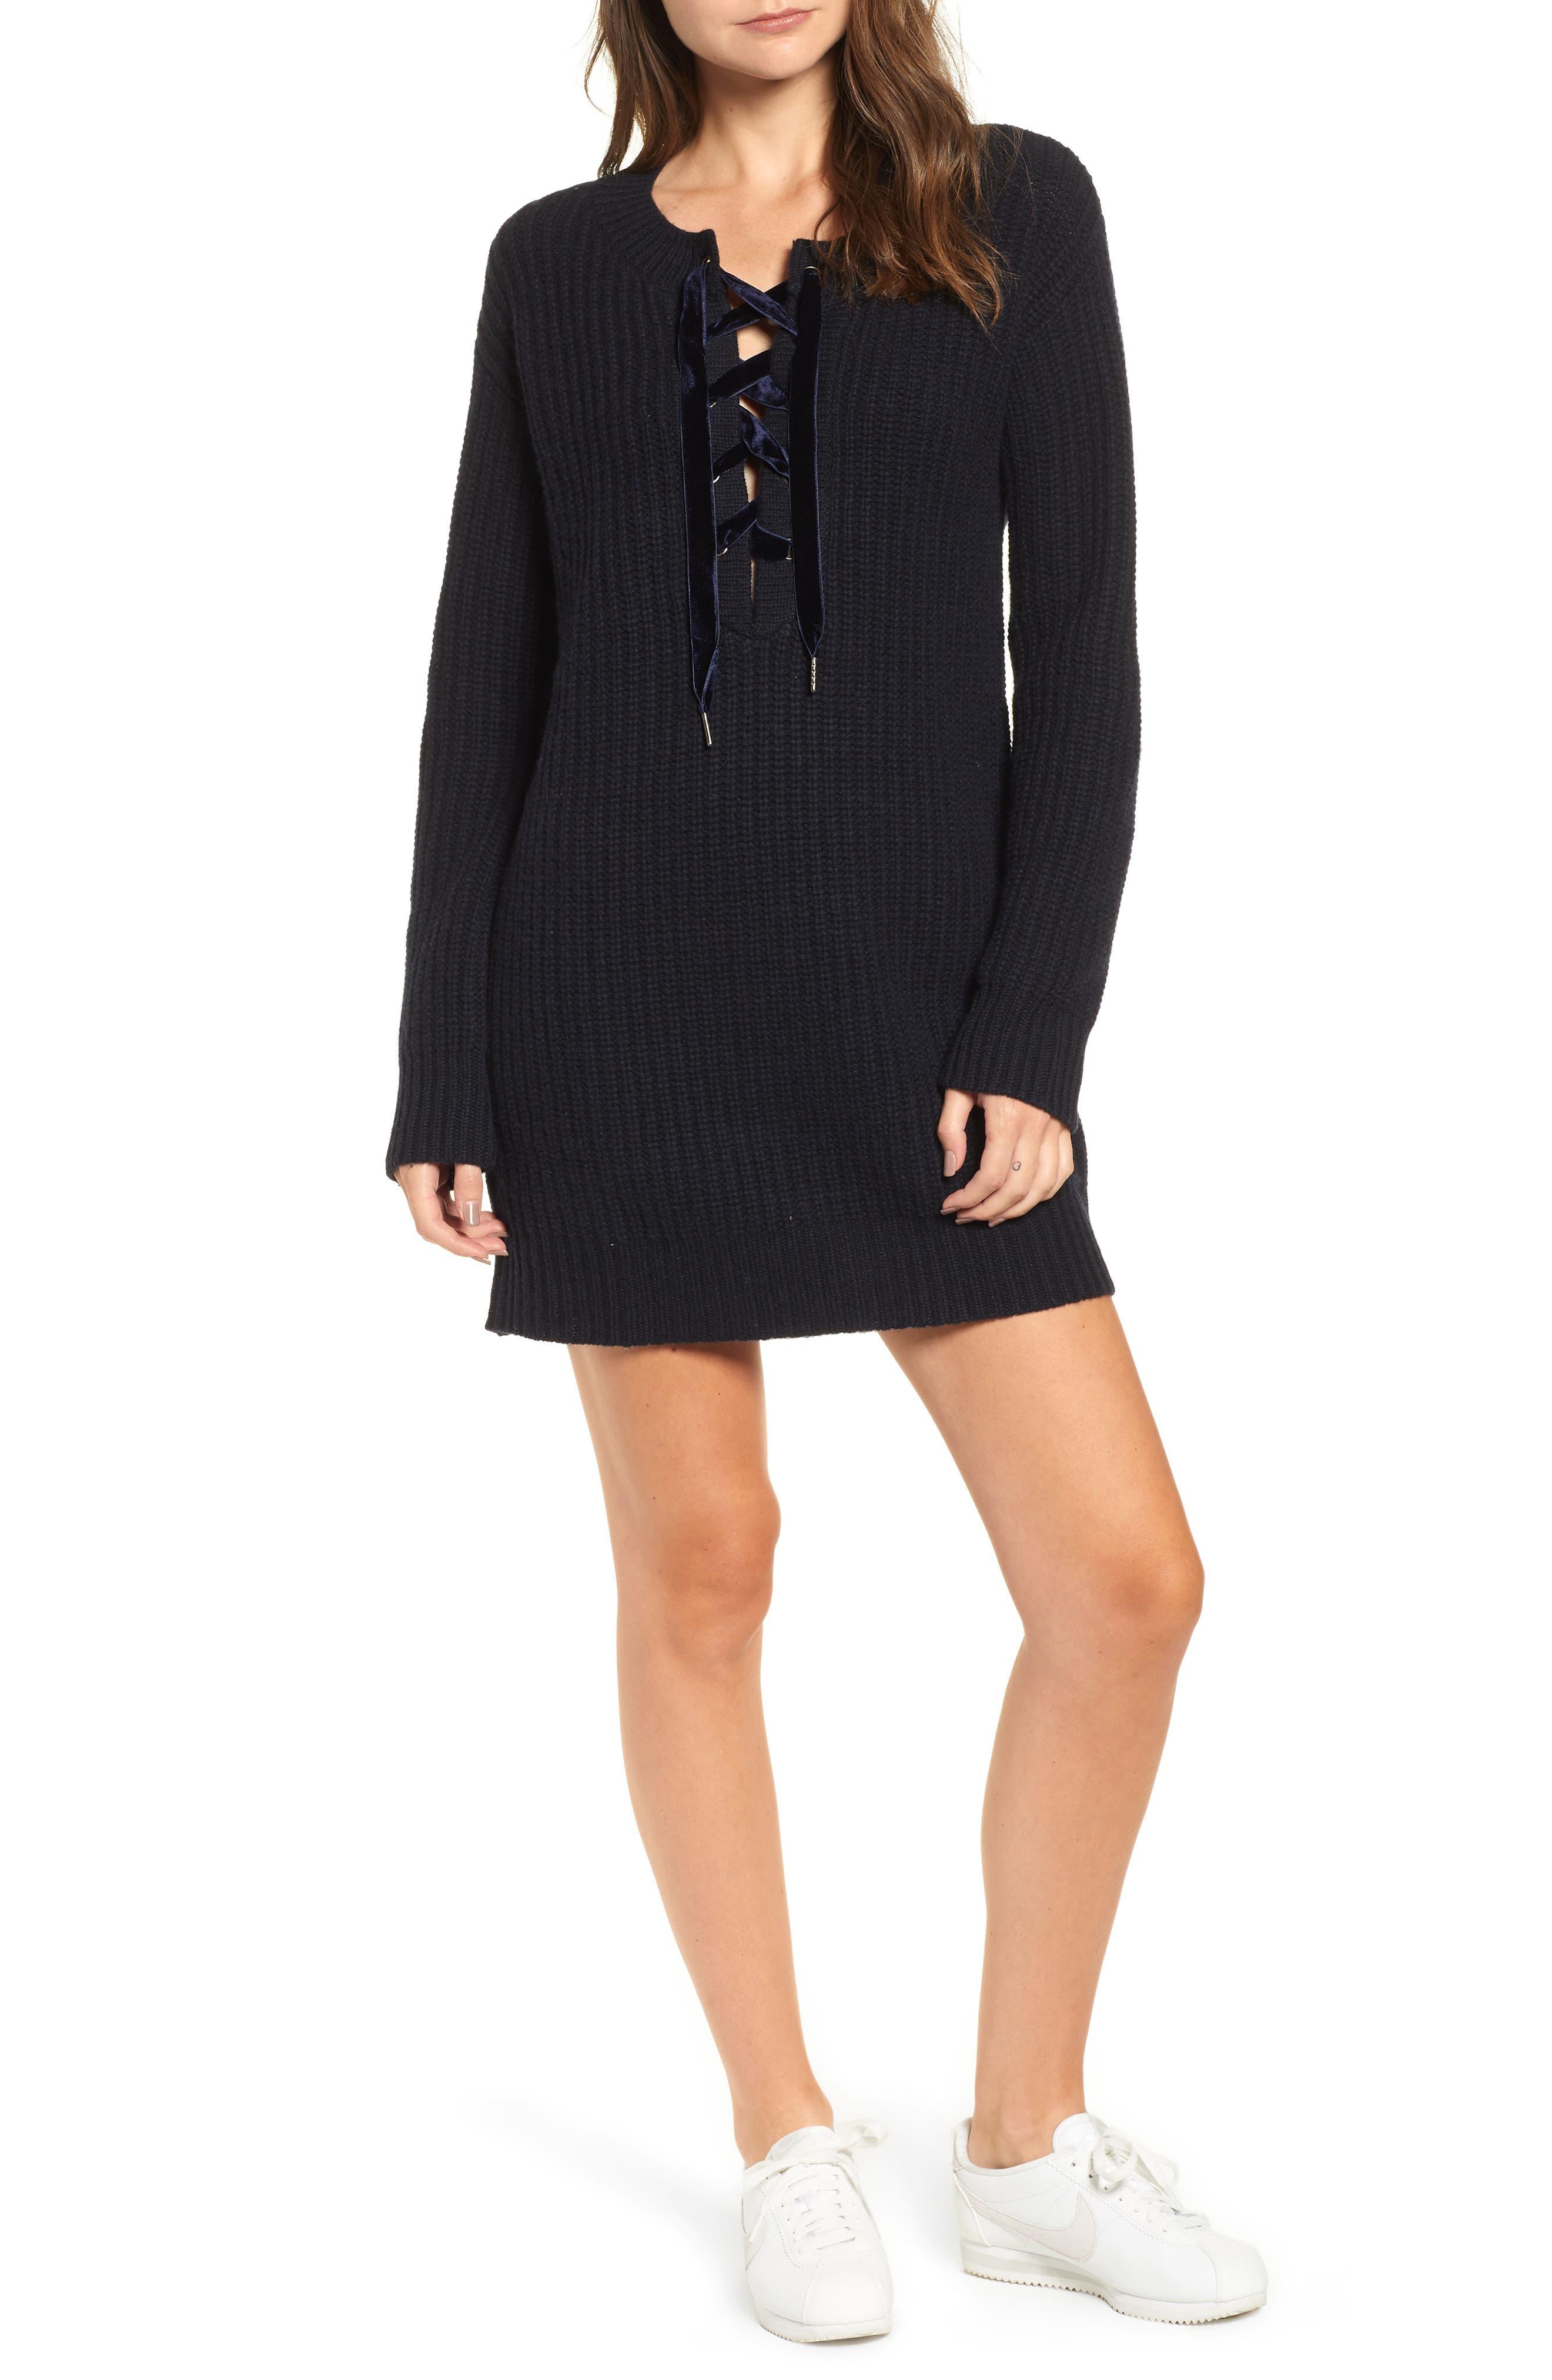 Nicole Velvet Tie Sweater Dress,                             Main thumbnail 1, color,                             400